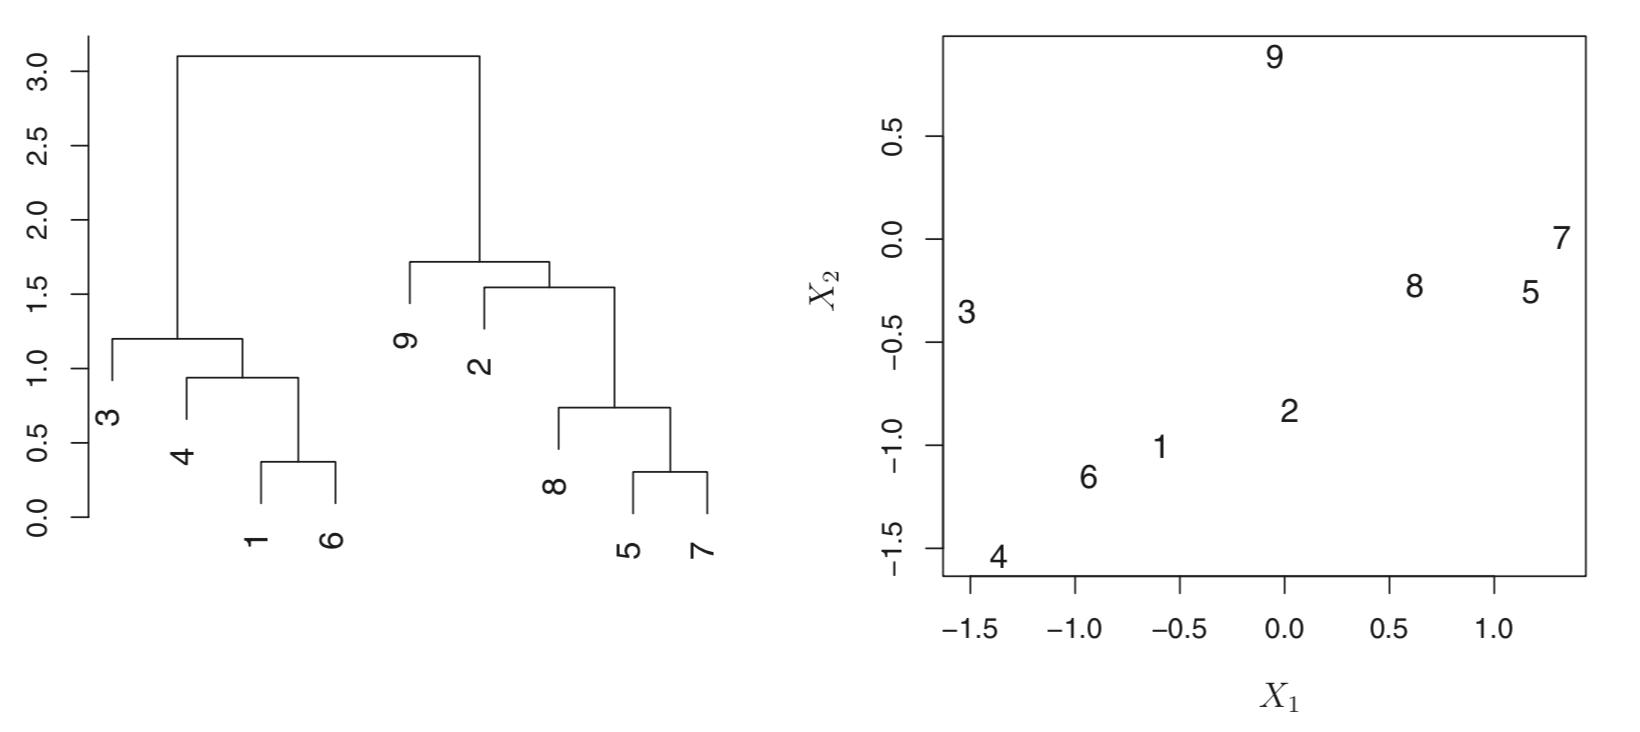 DataVis_and_clustering/hclust.png